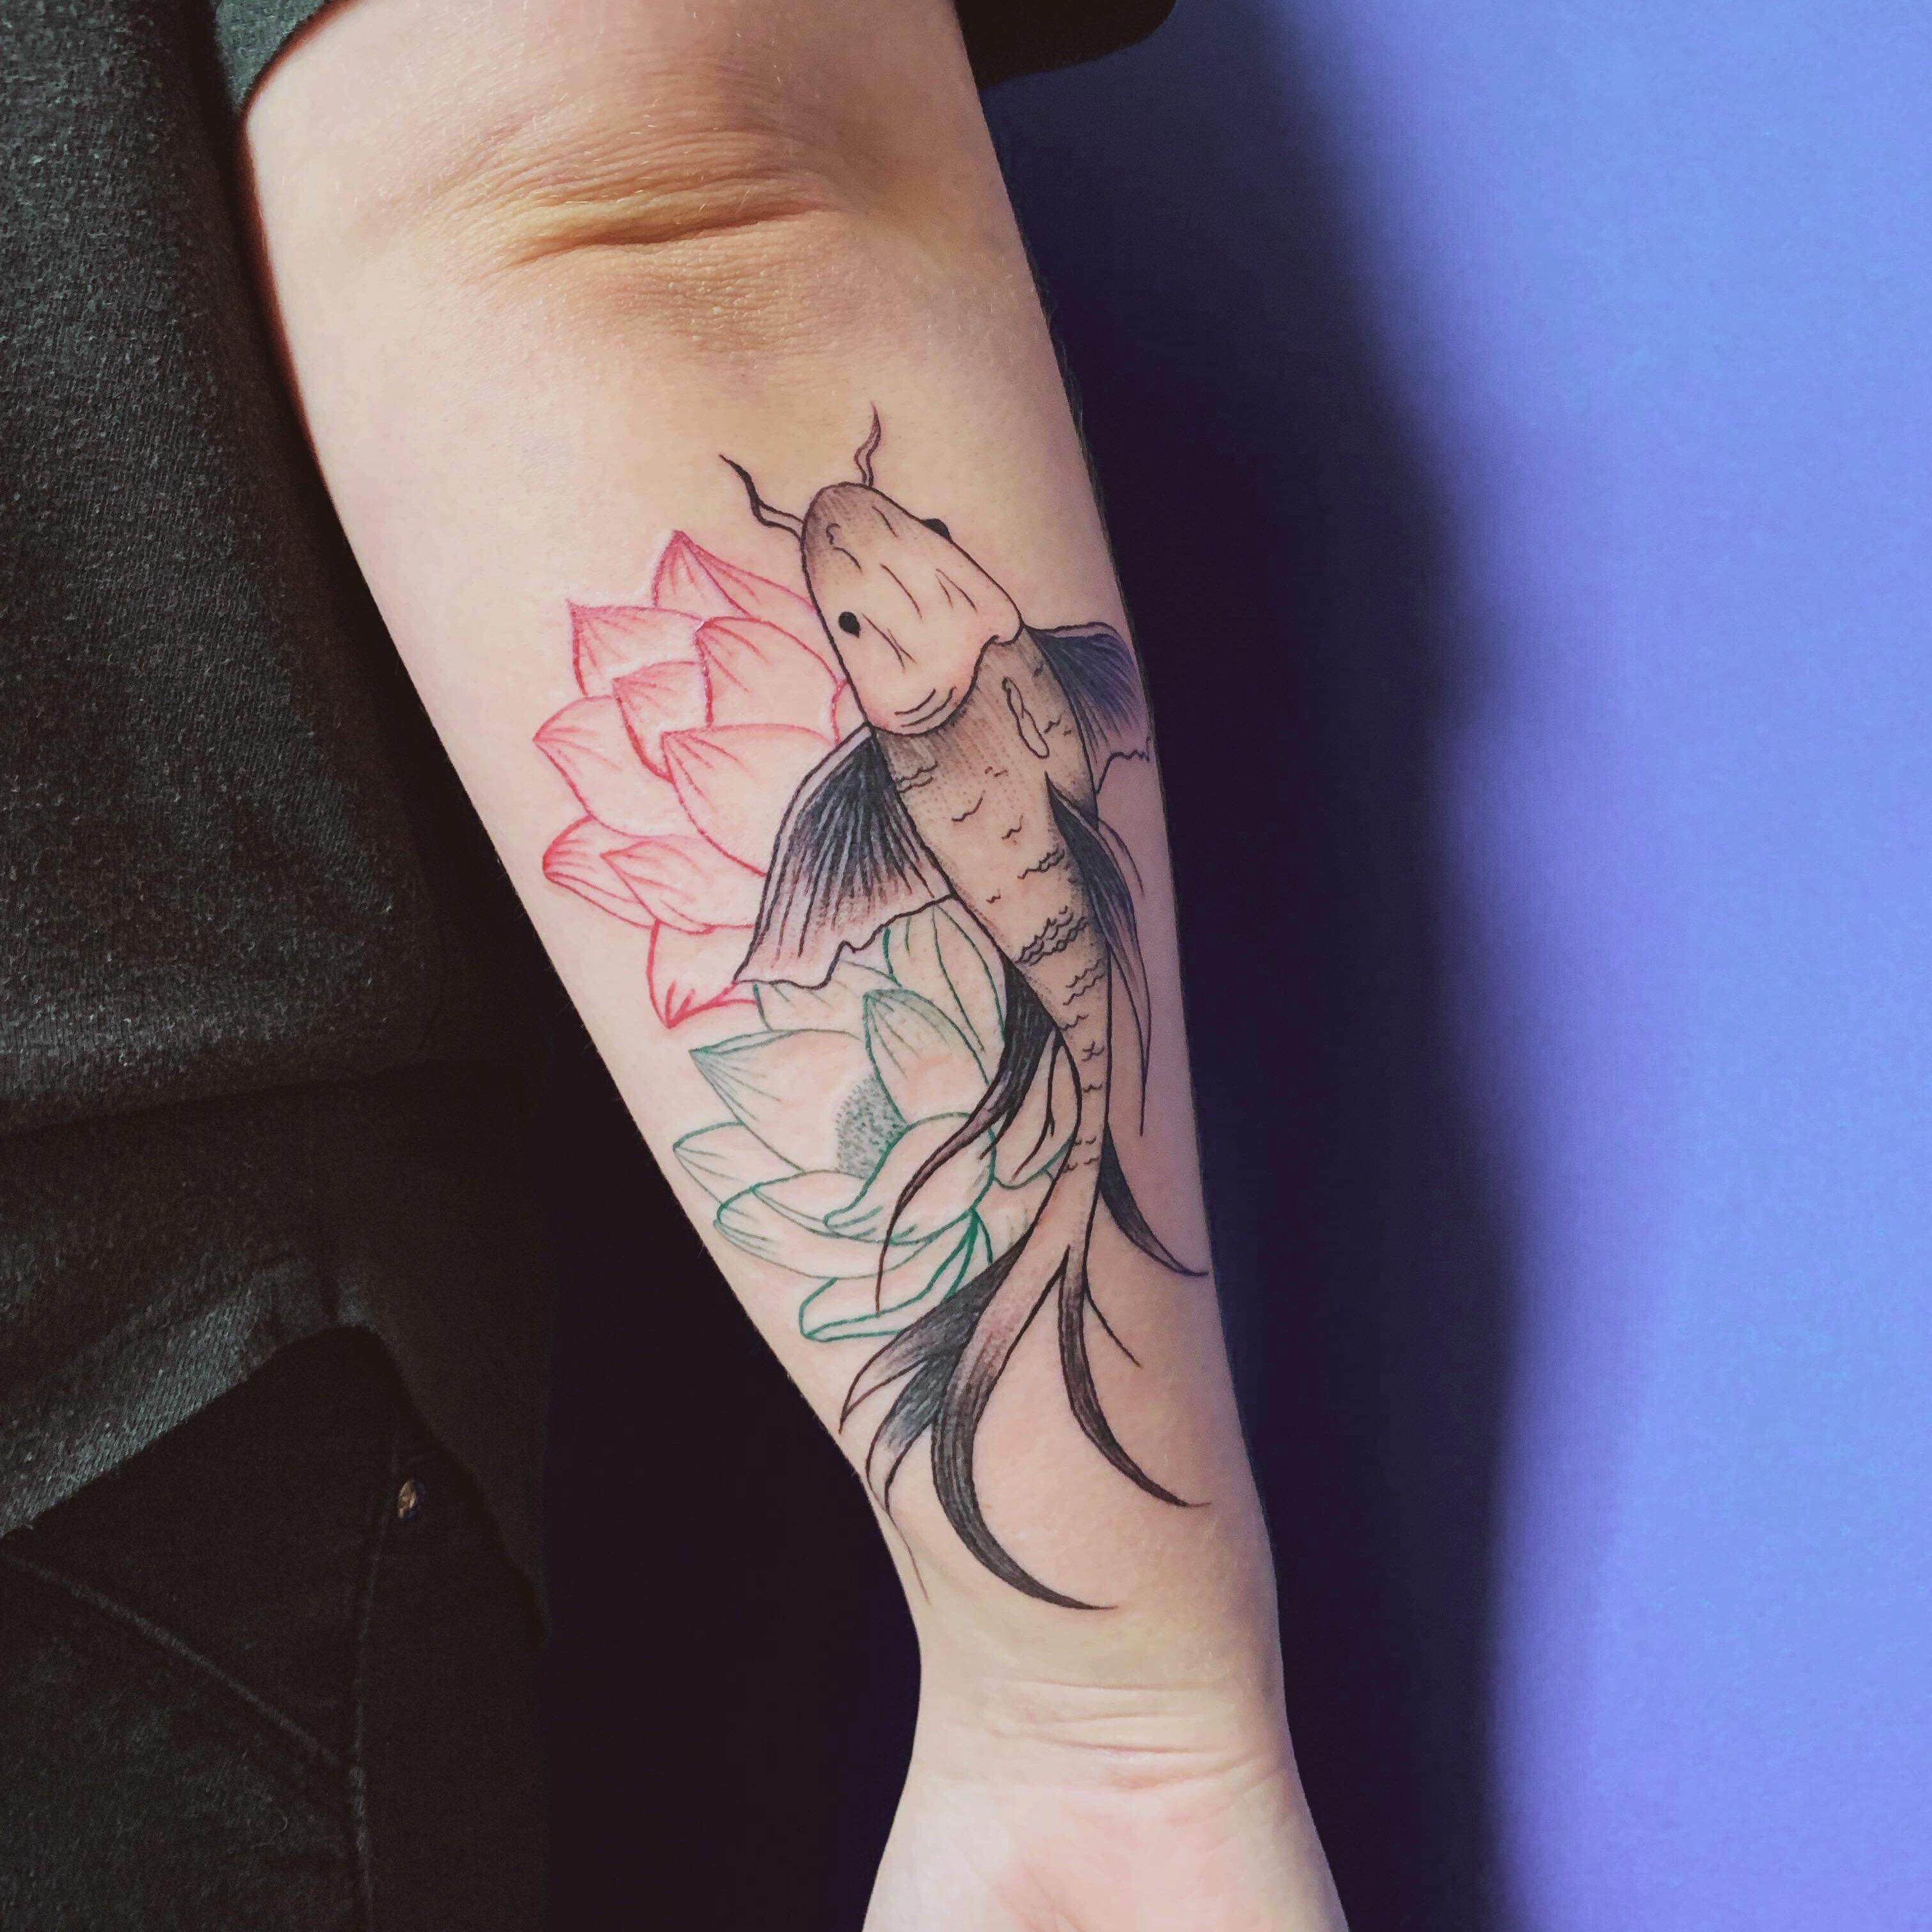 ©️ Abrakadabra Ink